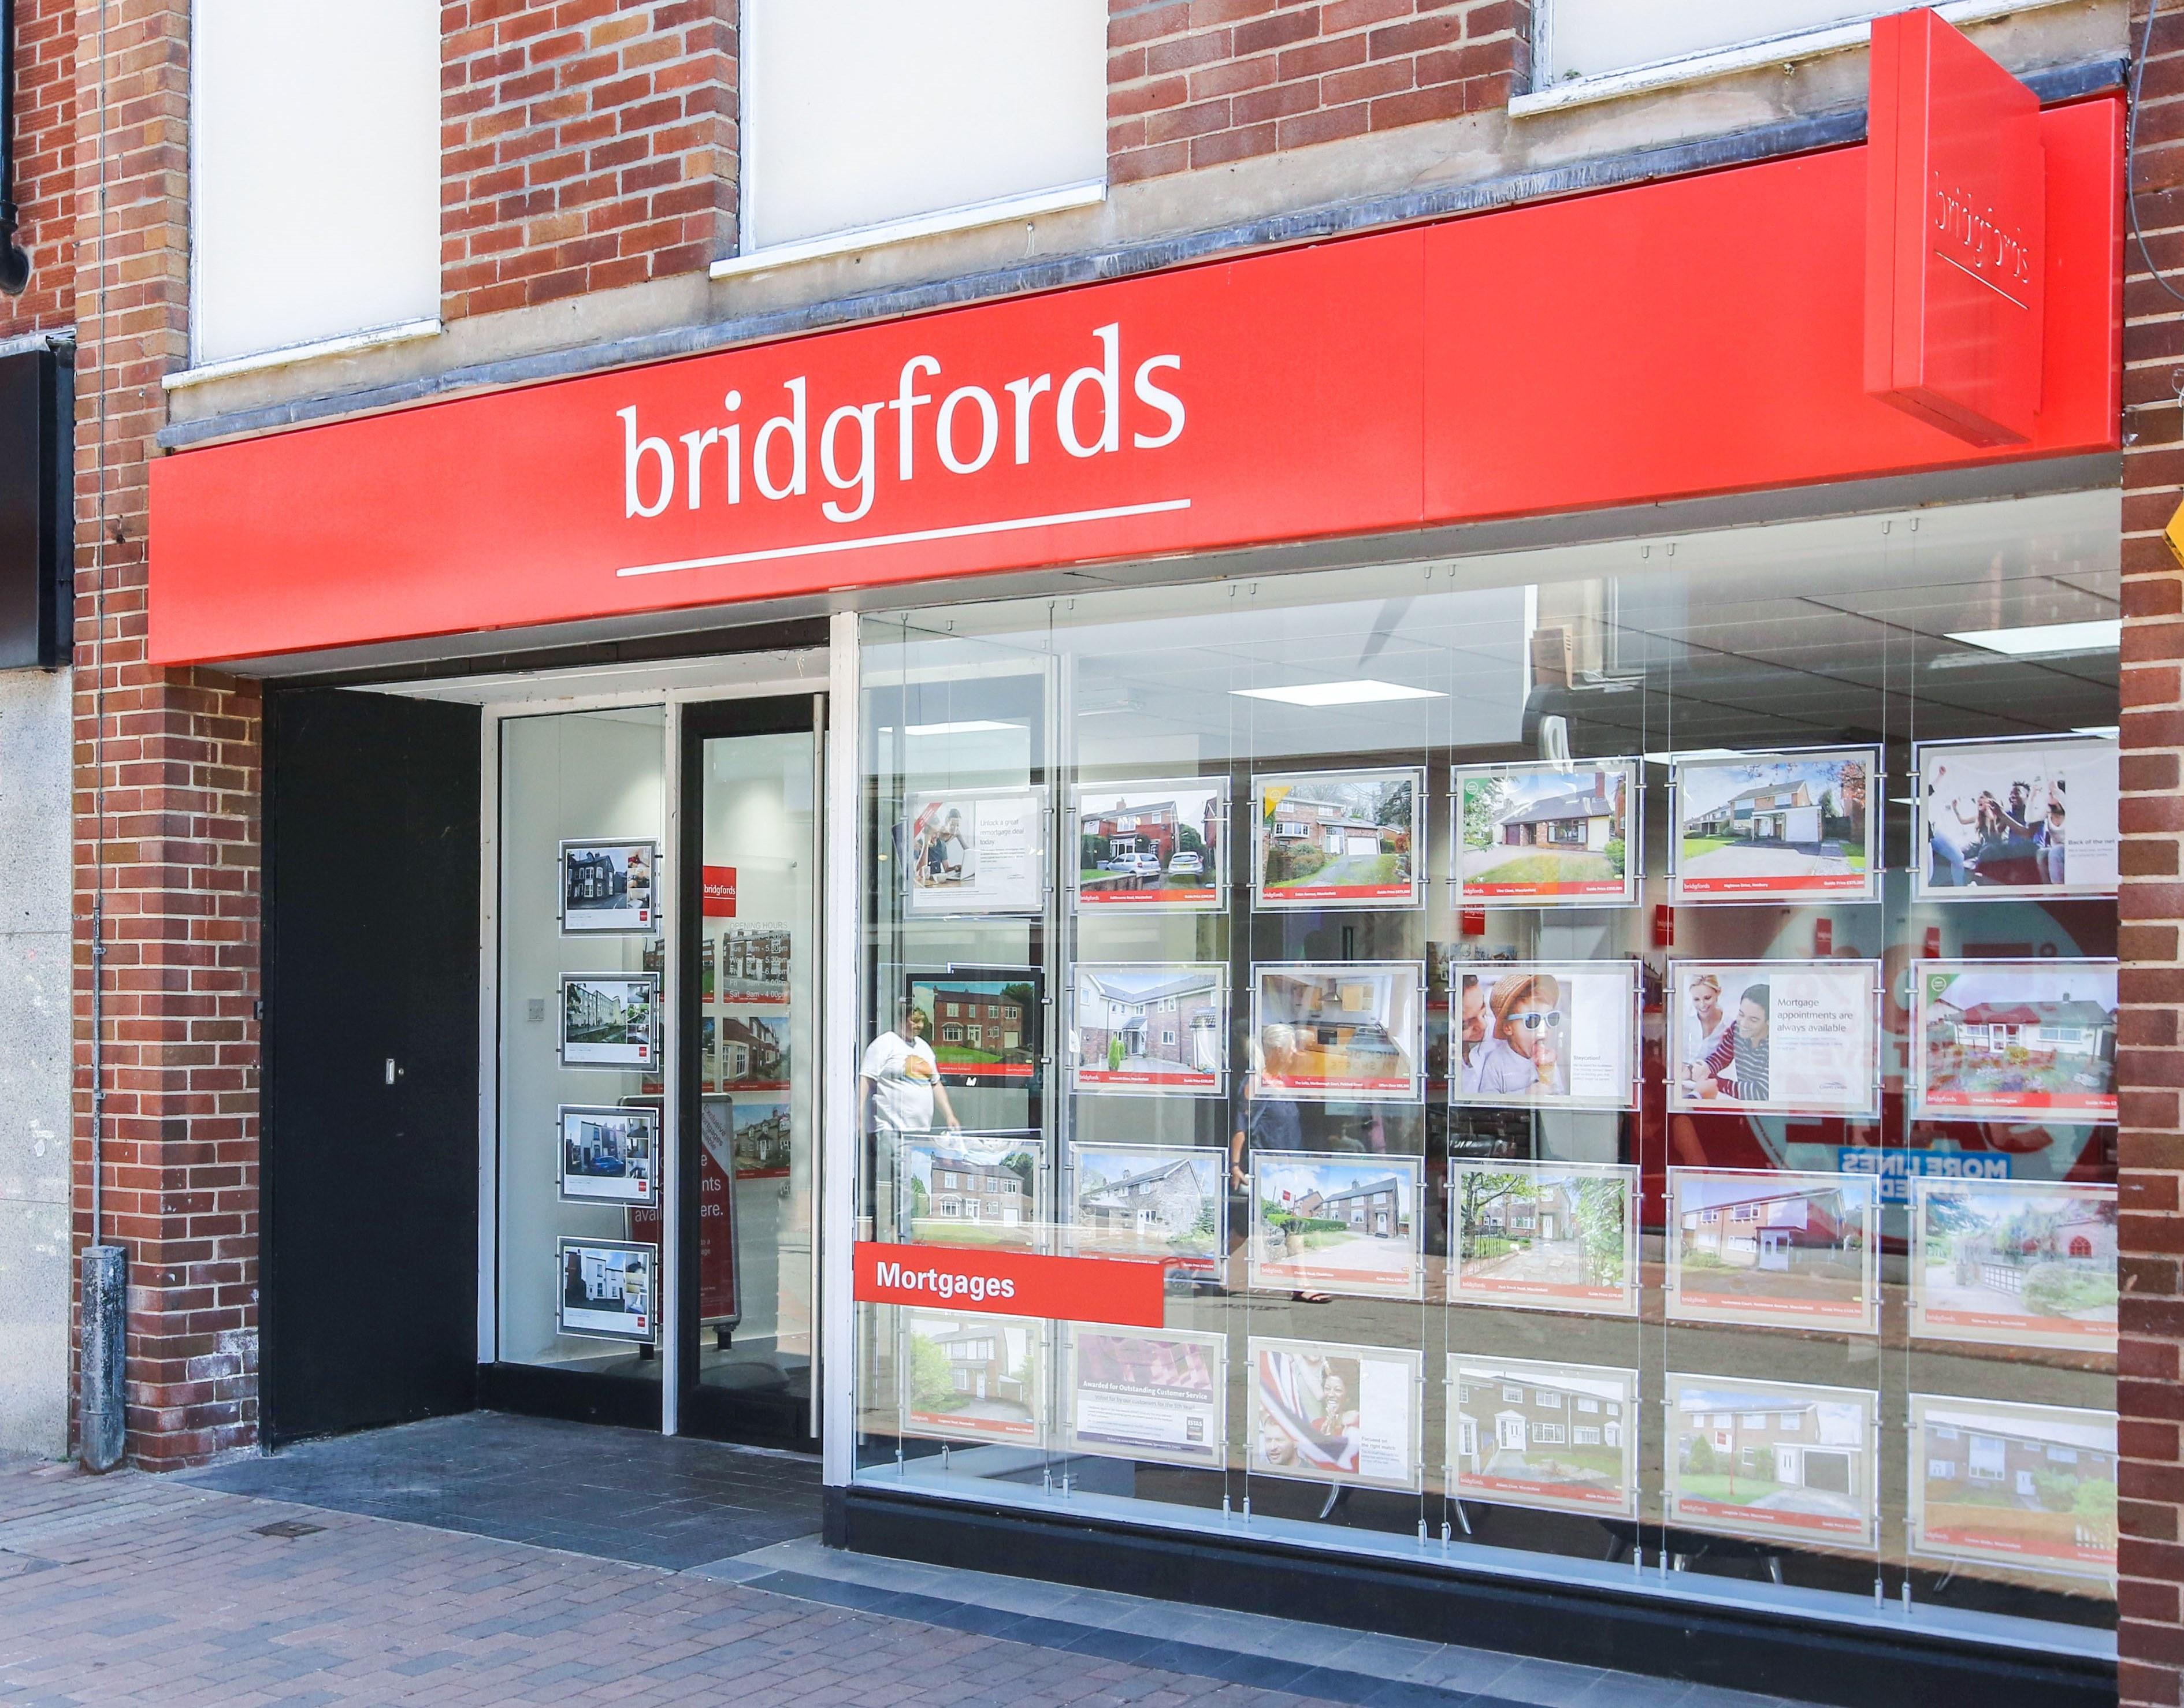 Bridgfords Estate Agents Macclesfield